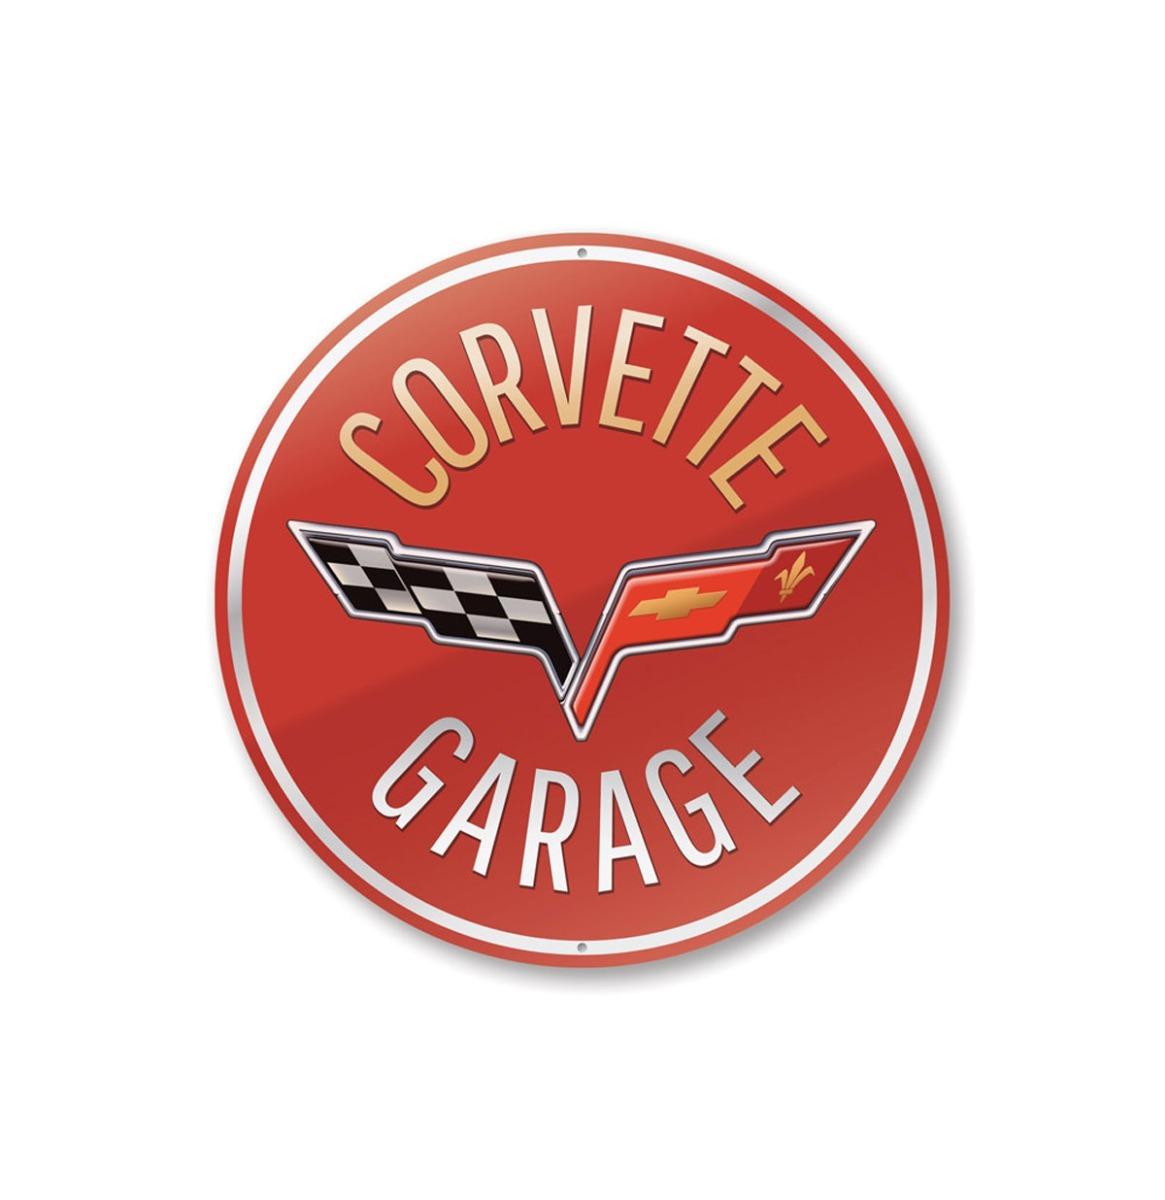 Corvette Garage Car Bord